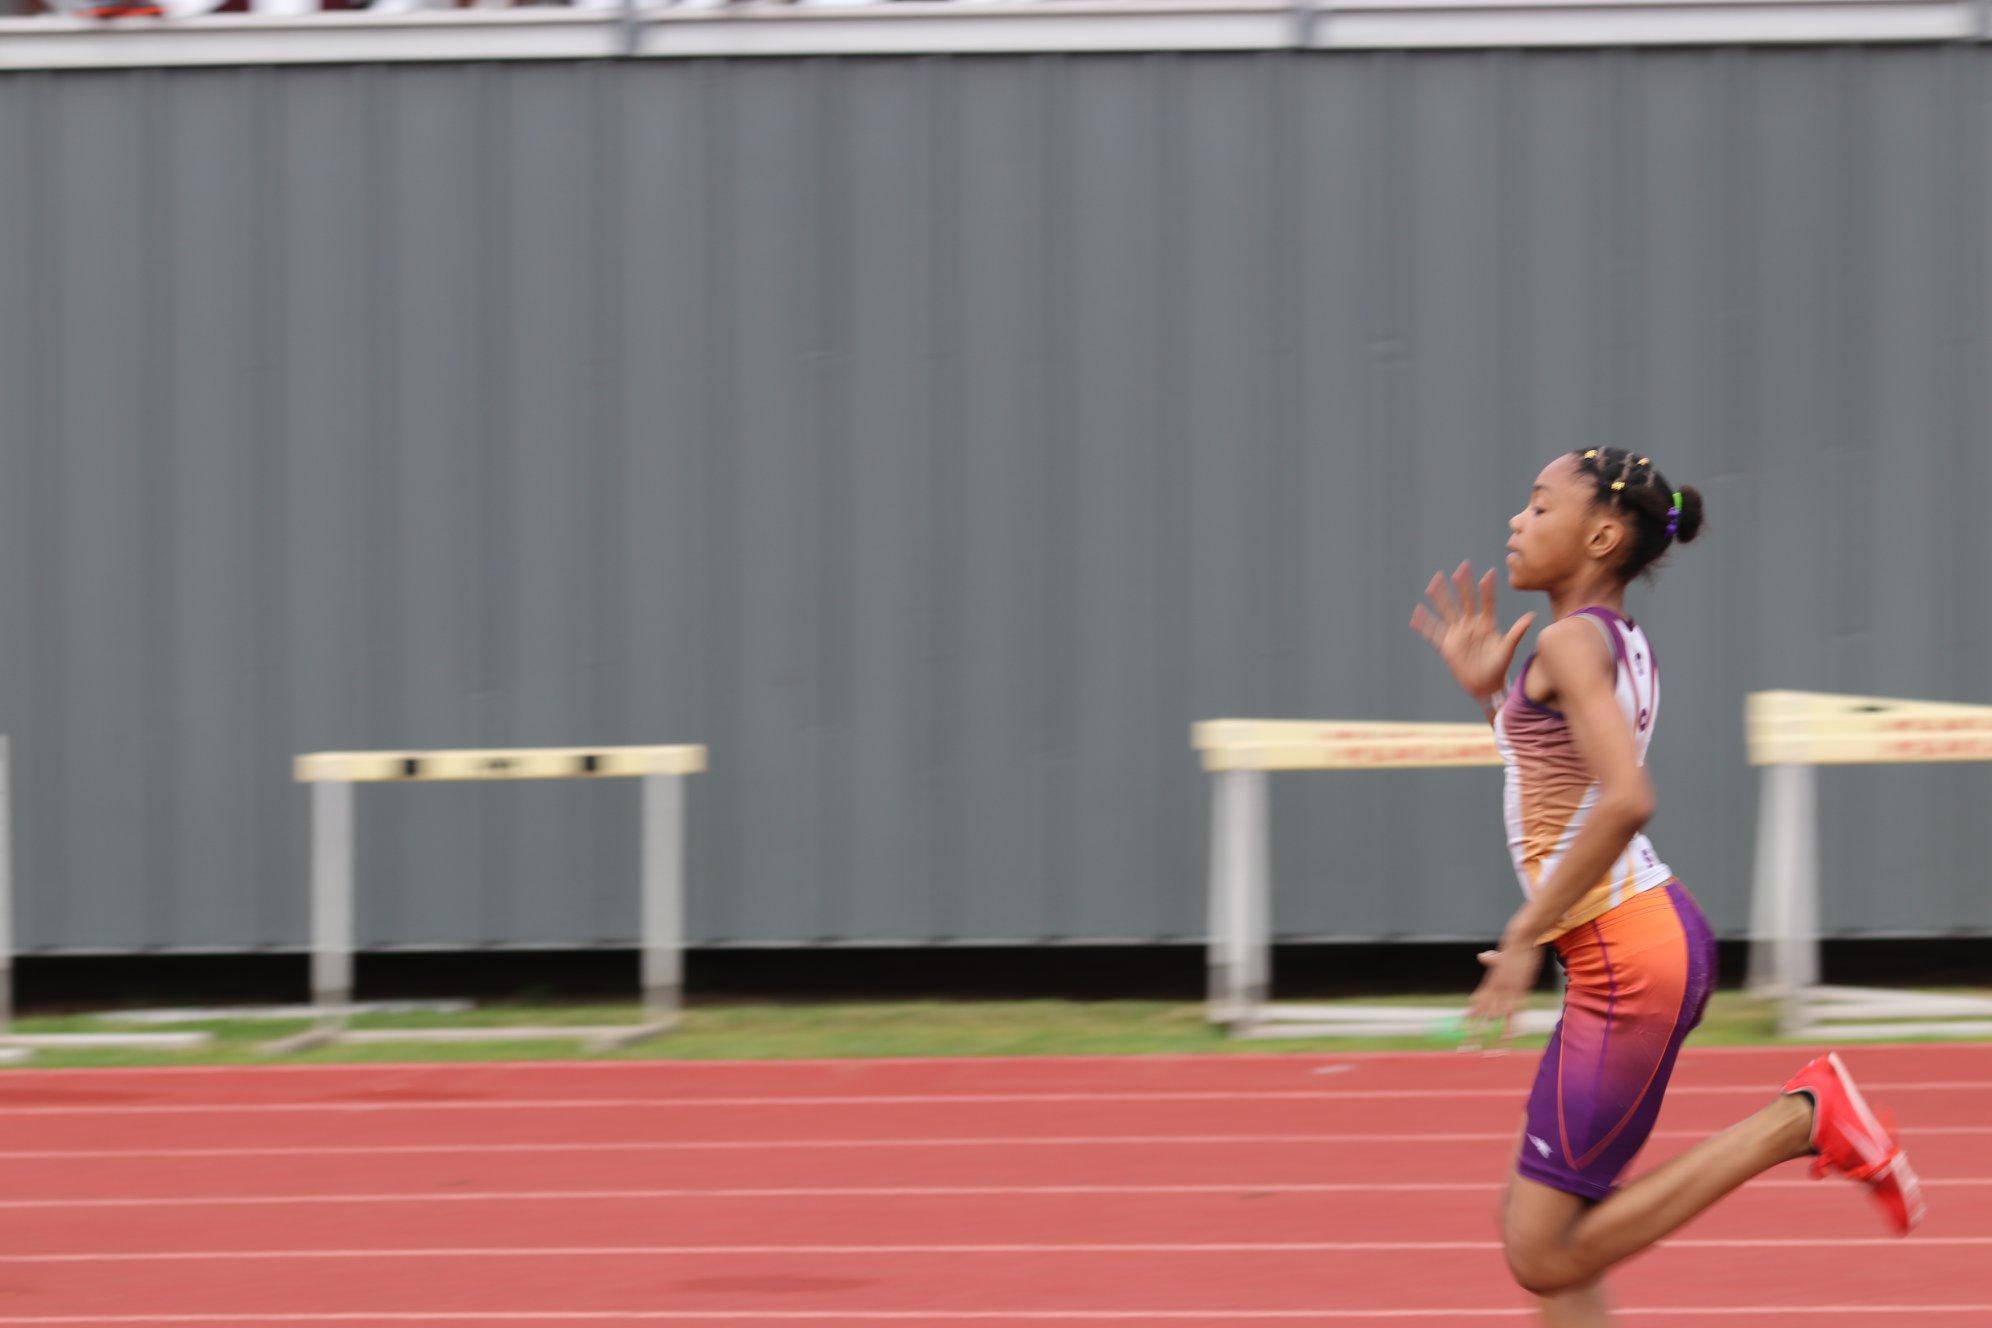 Jayla running the 100